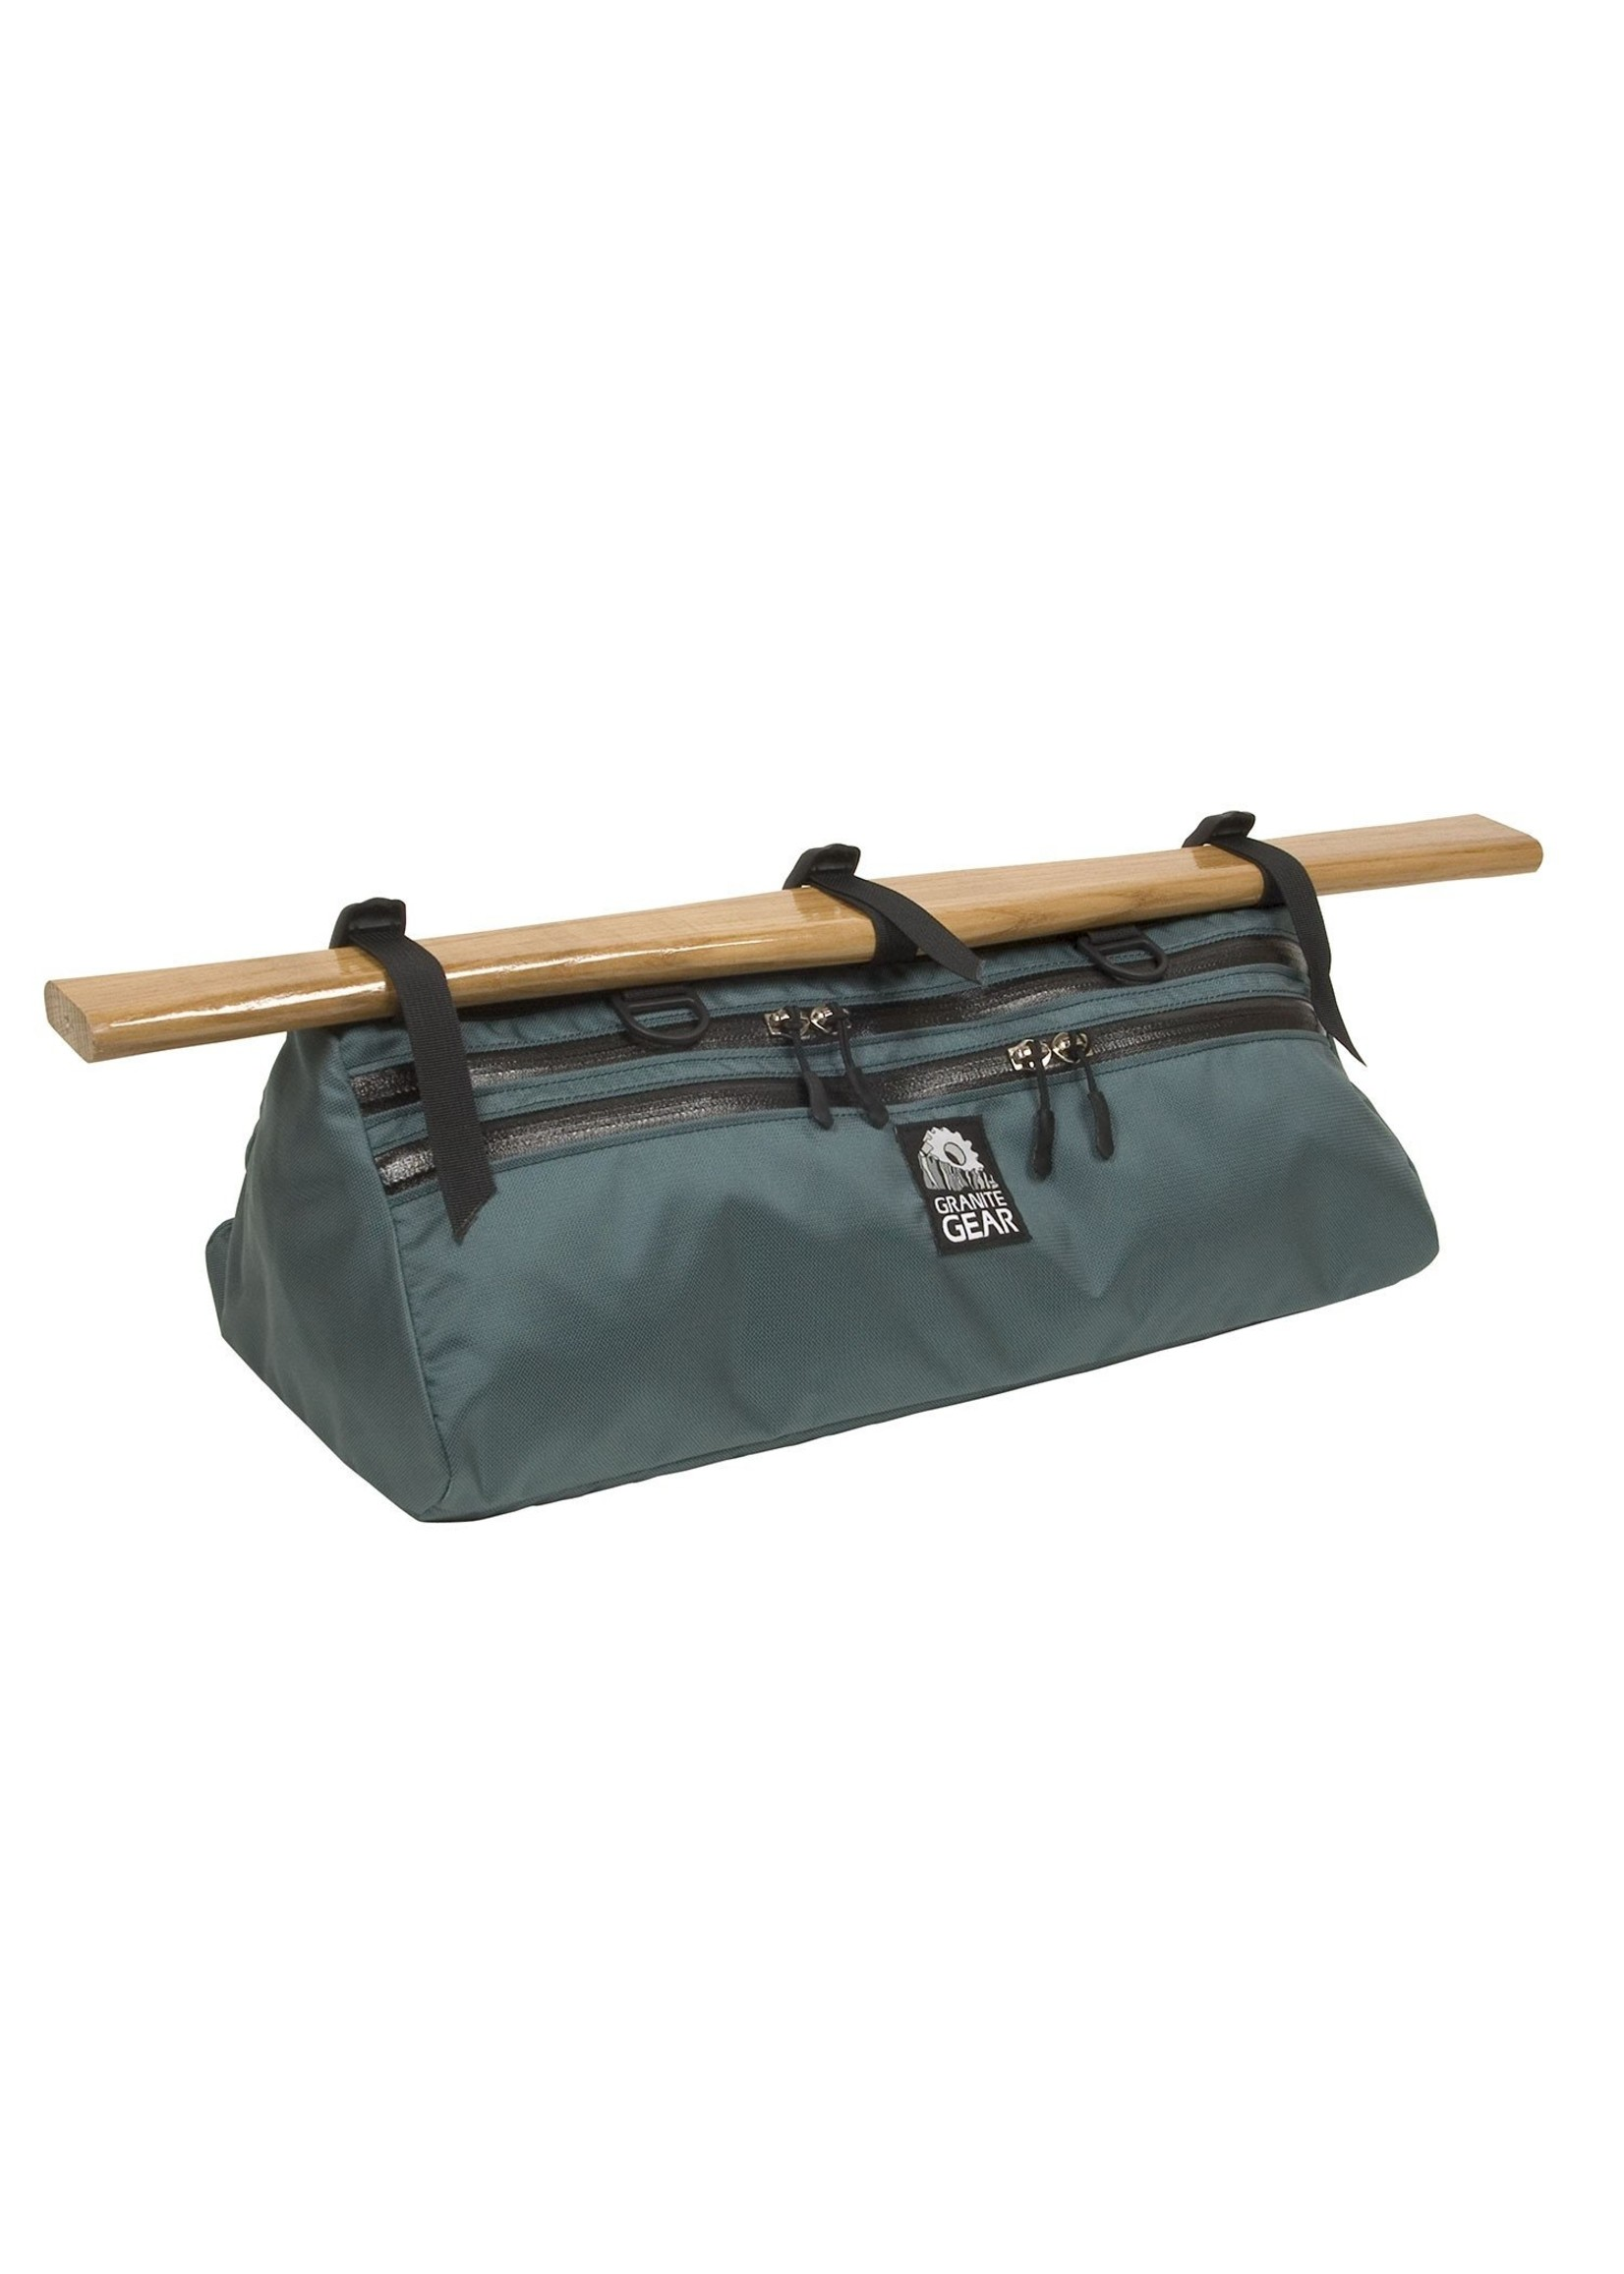 Granite Gear Granite Gear Wedge Thwart Bag Large Smoke Blue 15.5 L